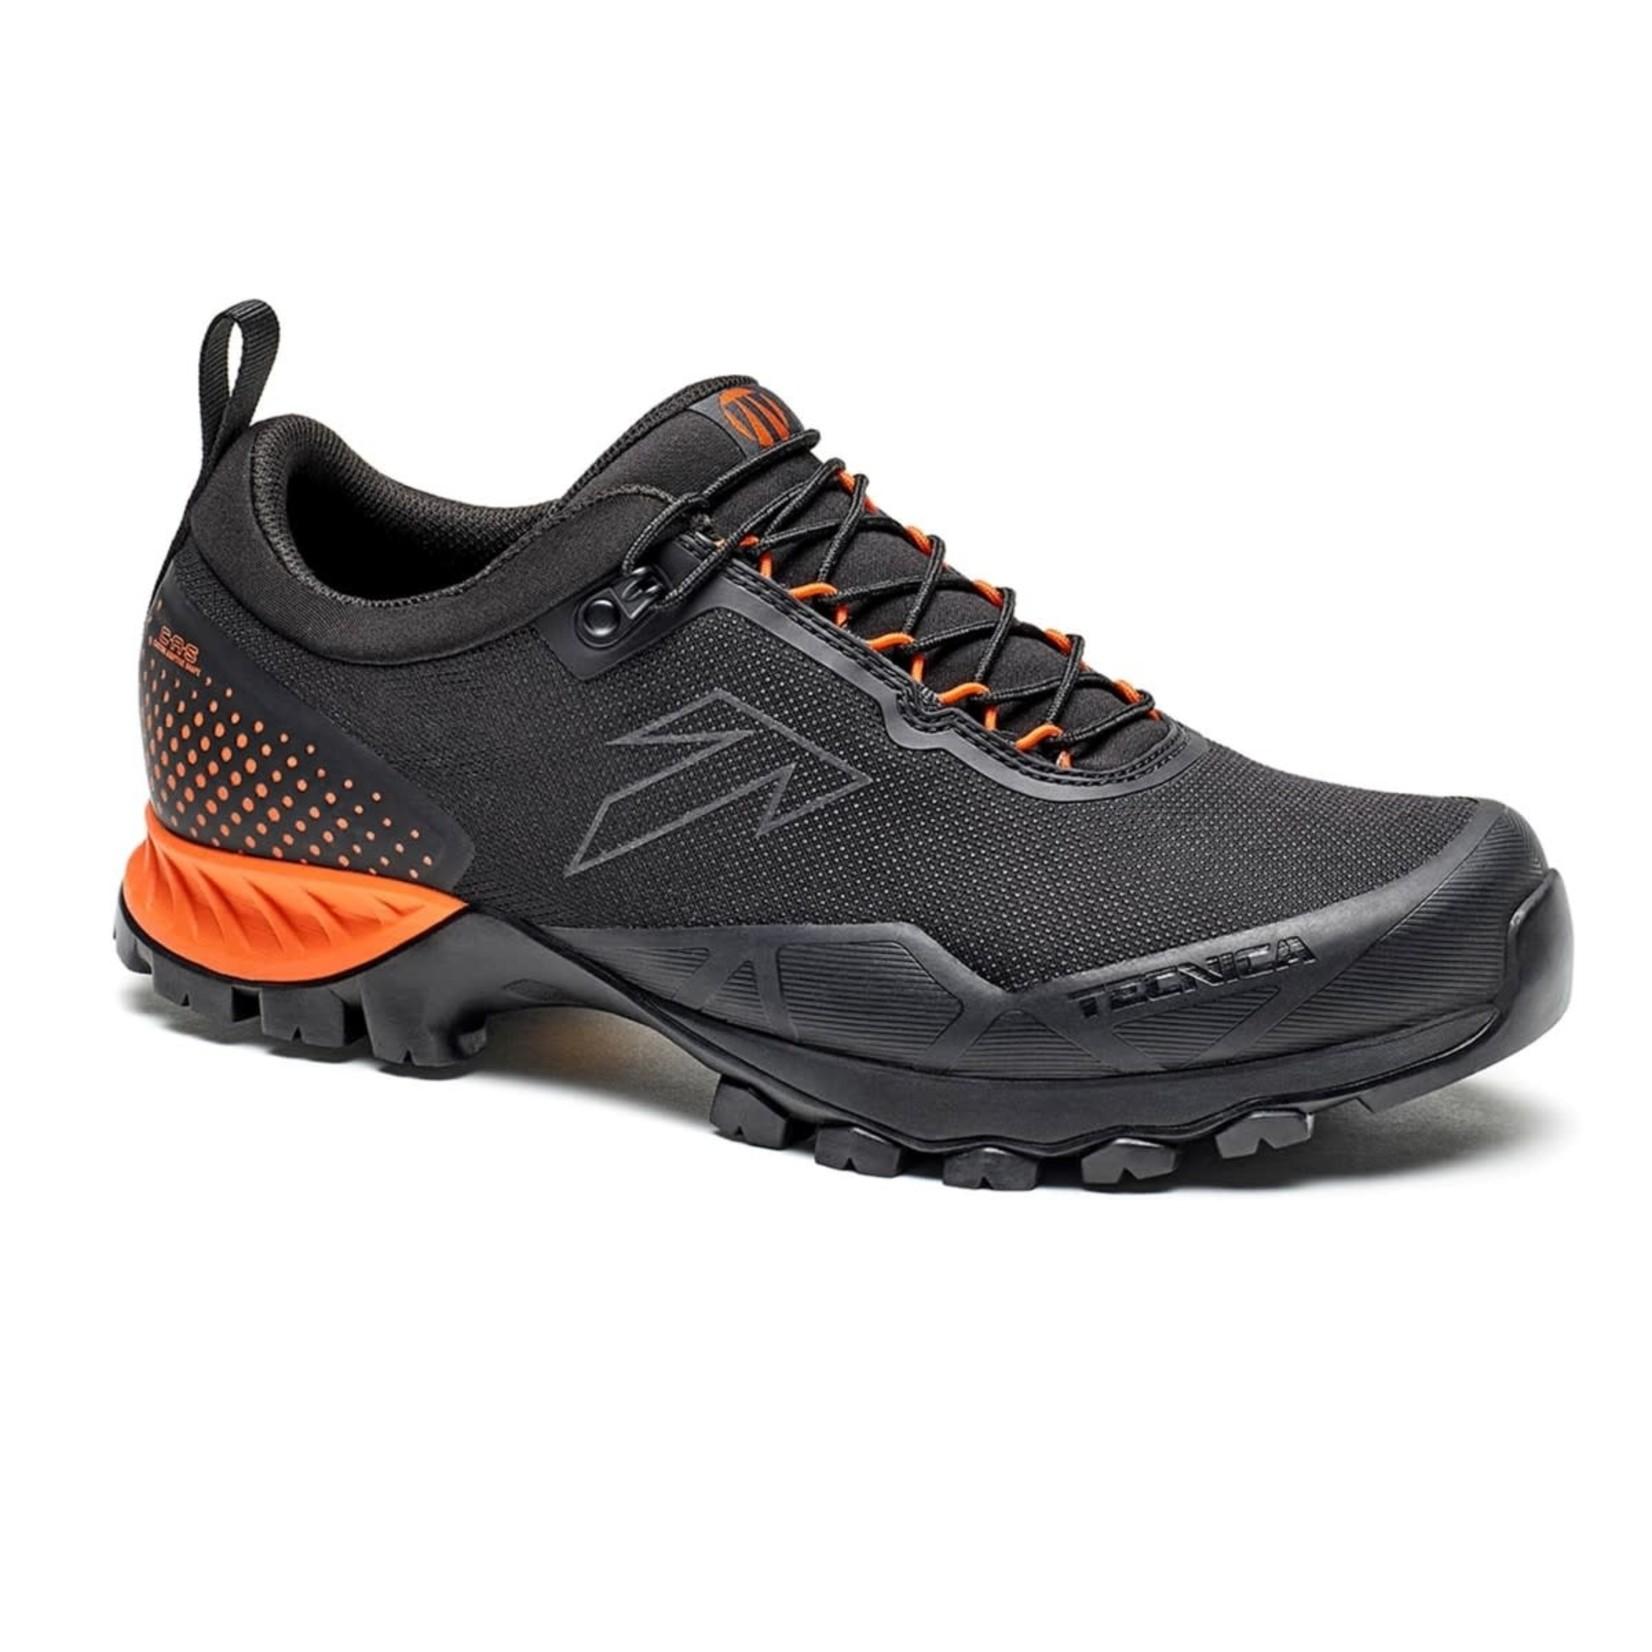 Tecnica Chaussures Tecnica Plasma S - Hommes